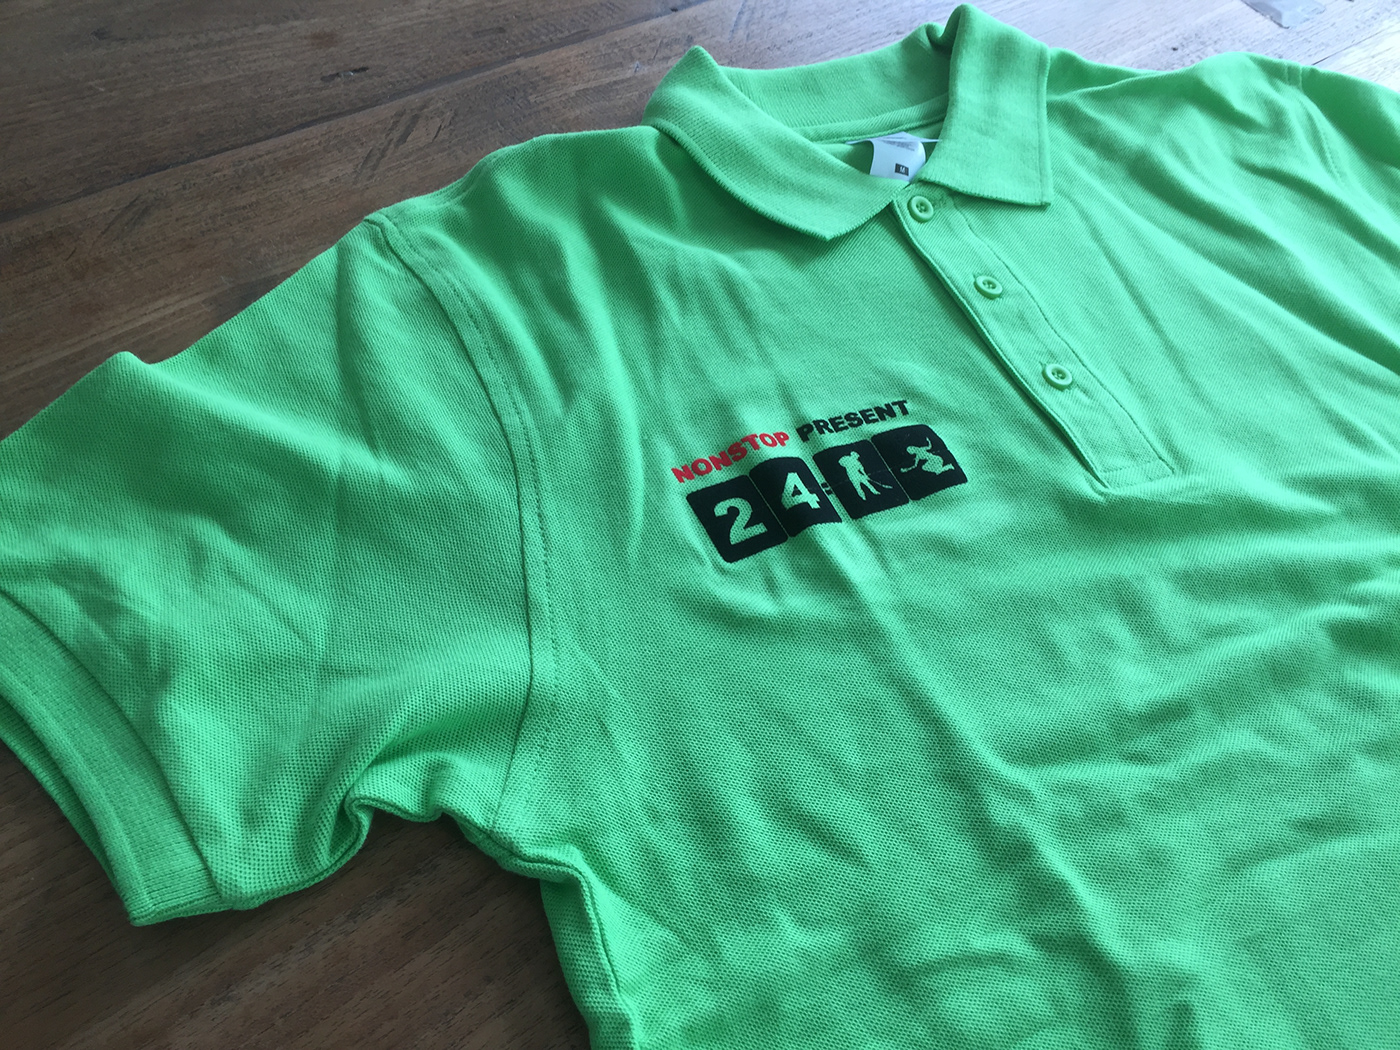 Image may contain: clothing, active shirt and sleeve